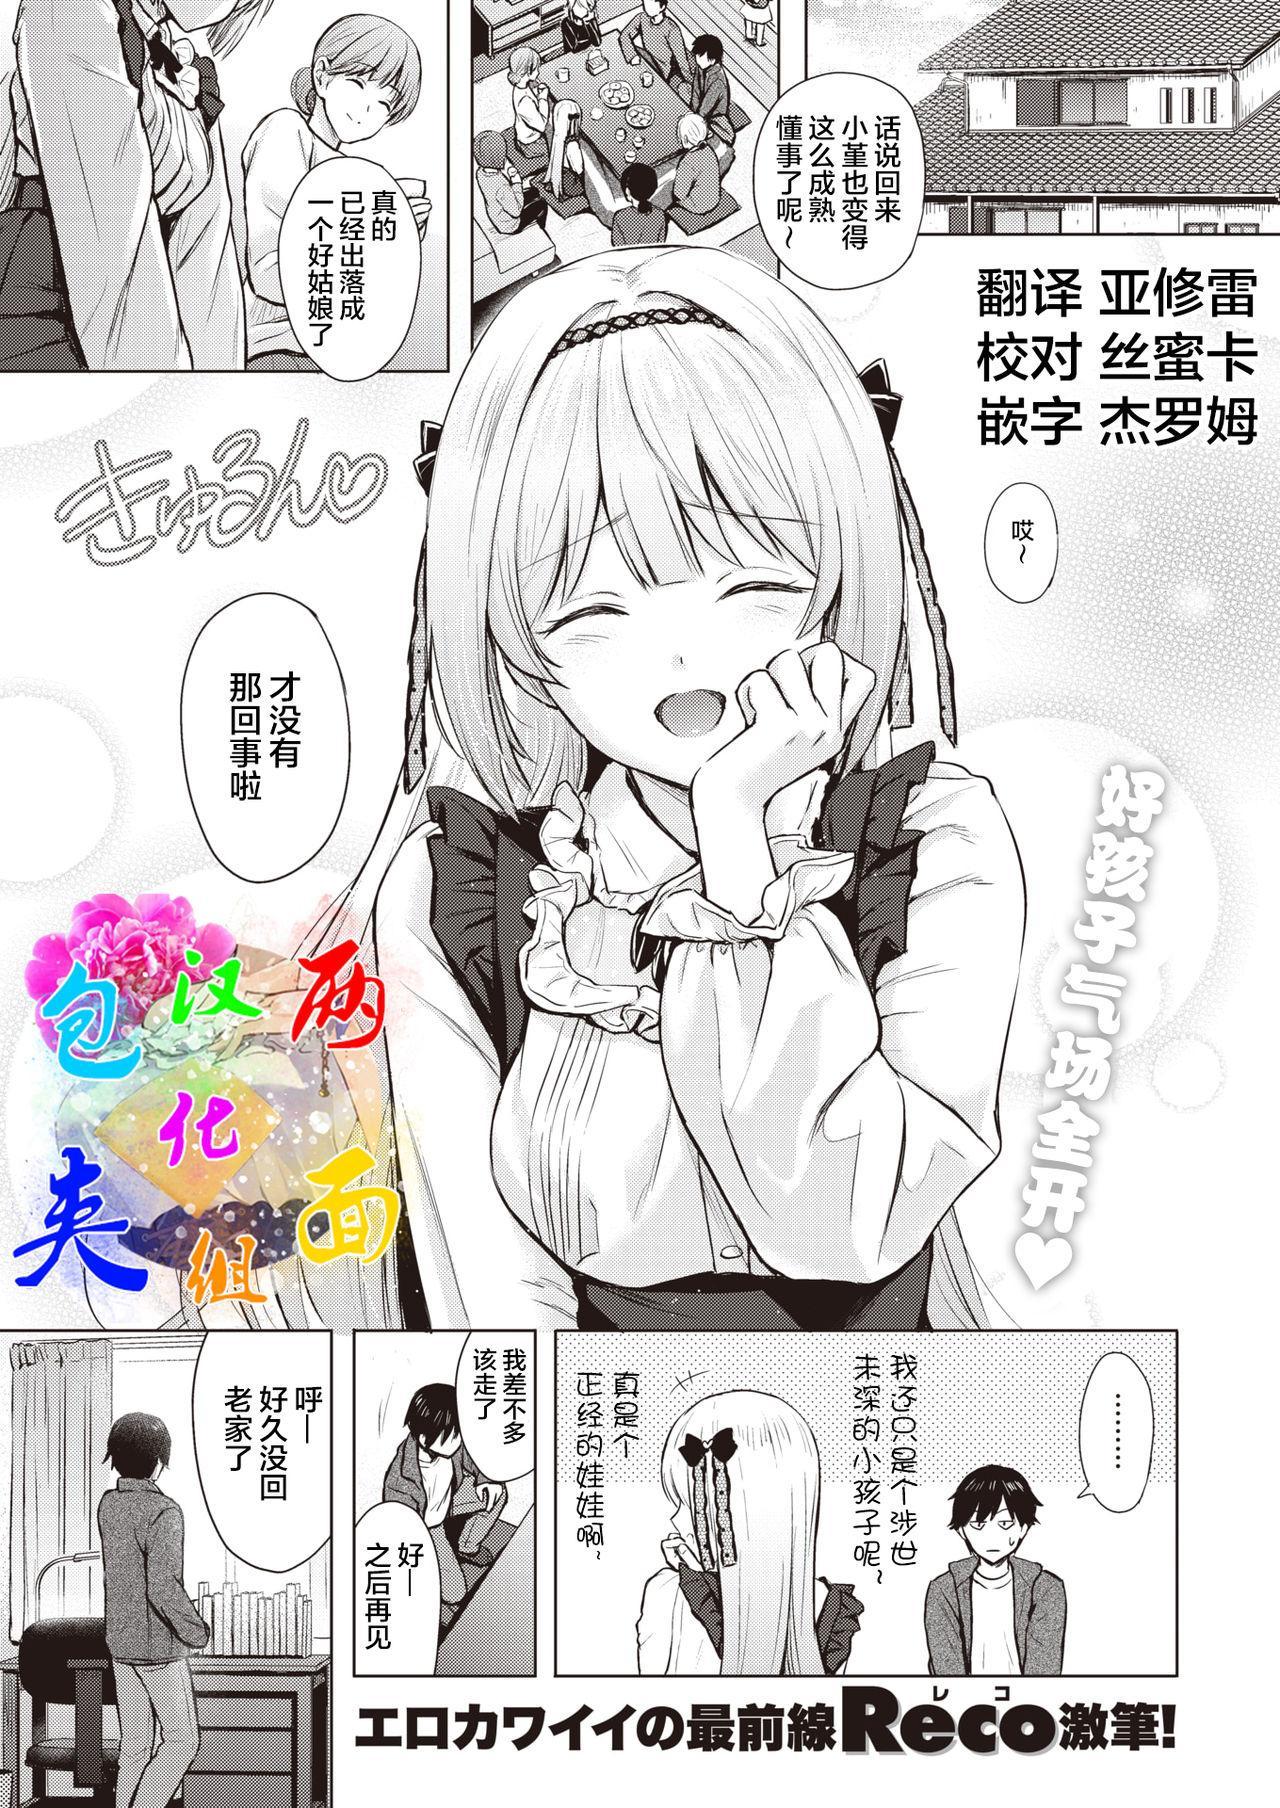 Shiroi Sumire 0